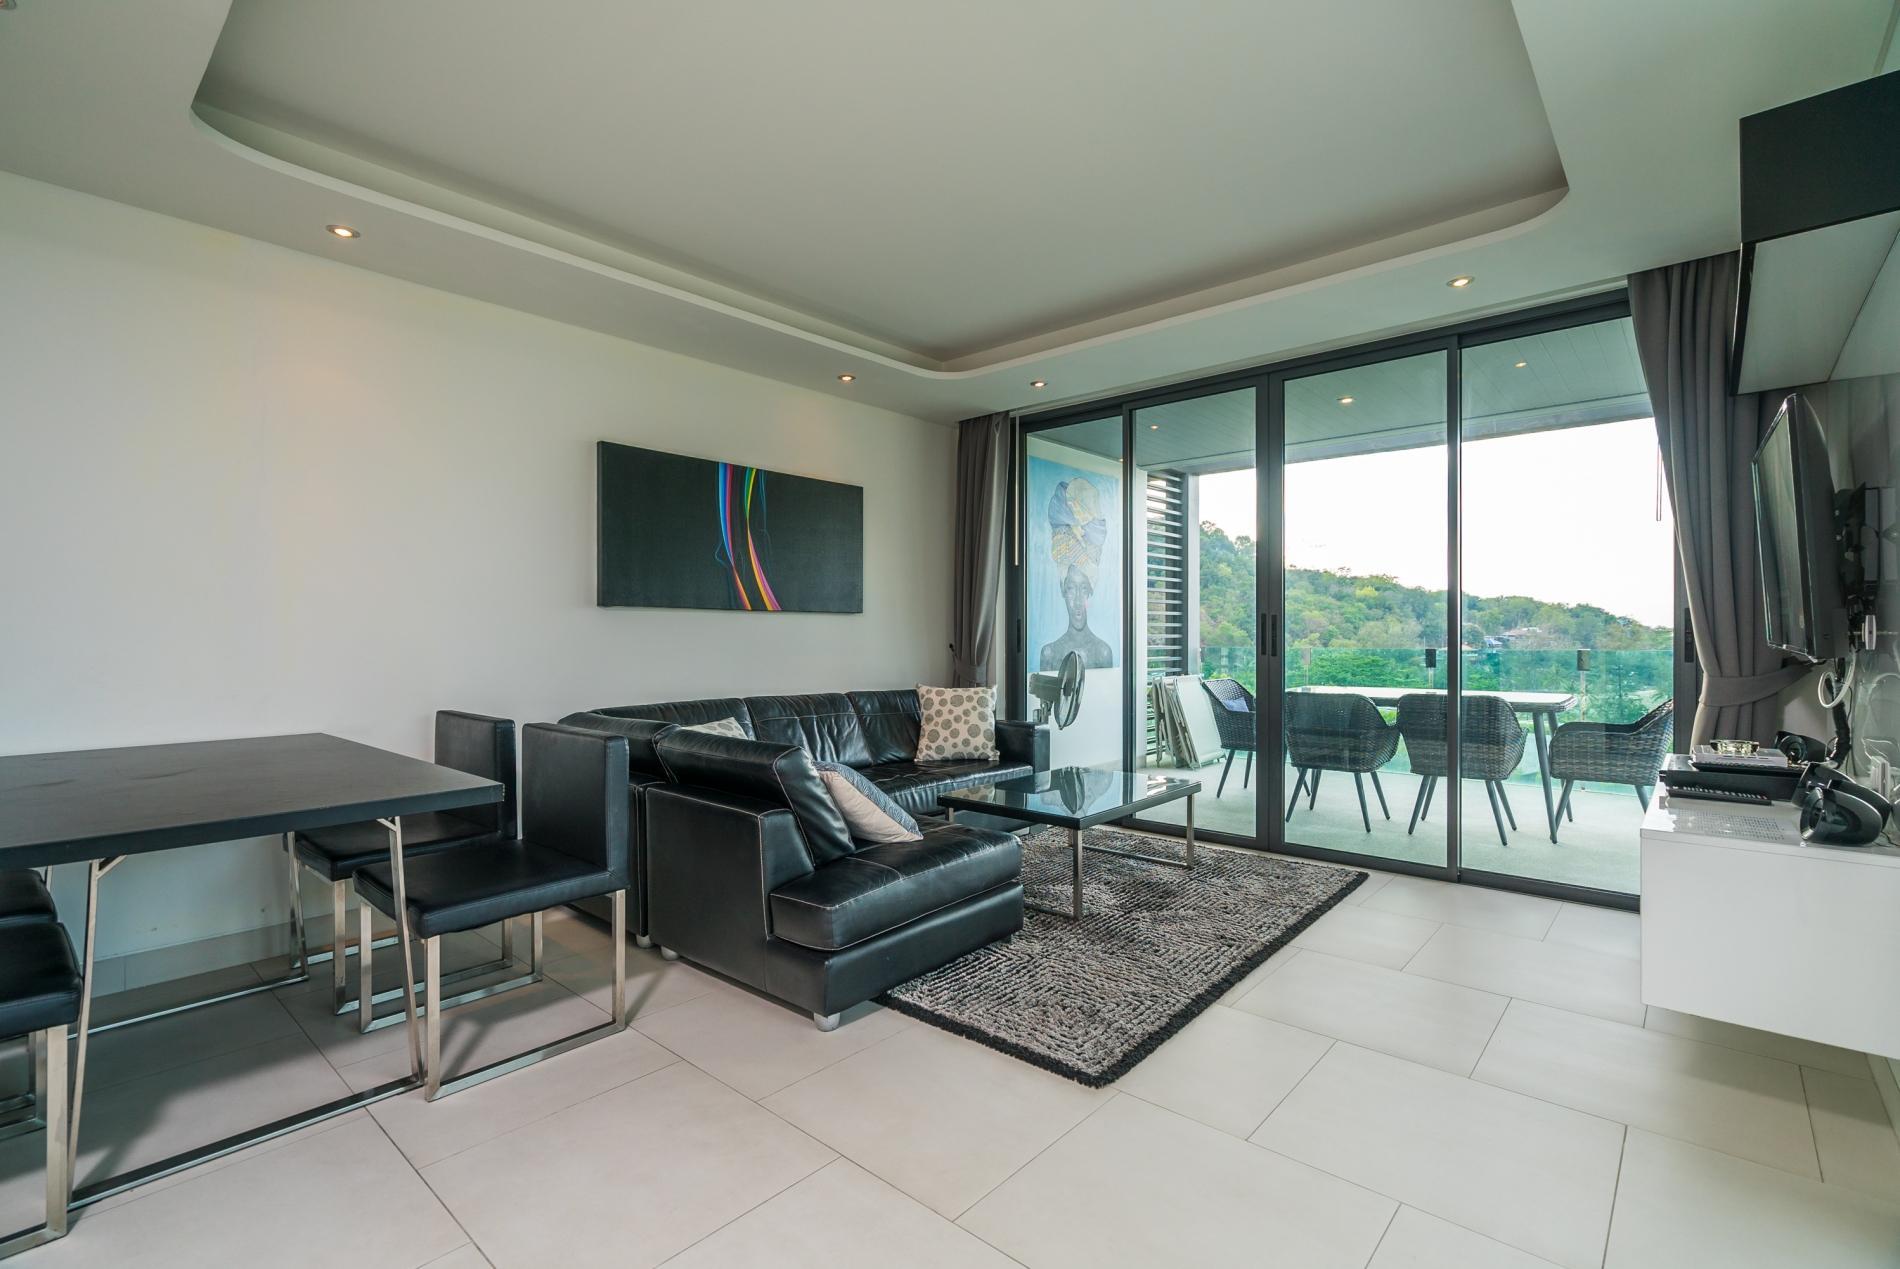 Apartment Twin Sands 1406 - Panoramic seaview apartment walk to beach  shared pool photo 17053730